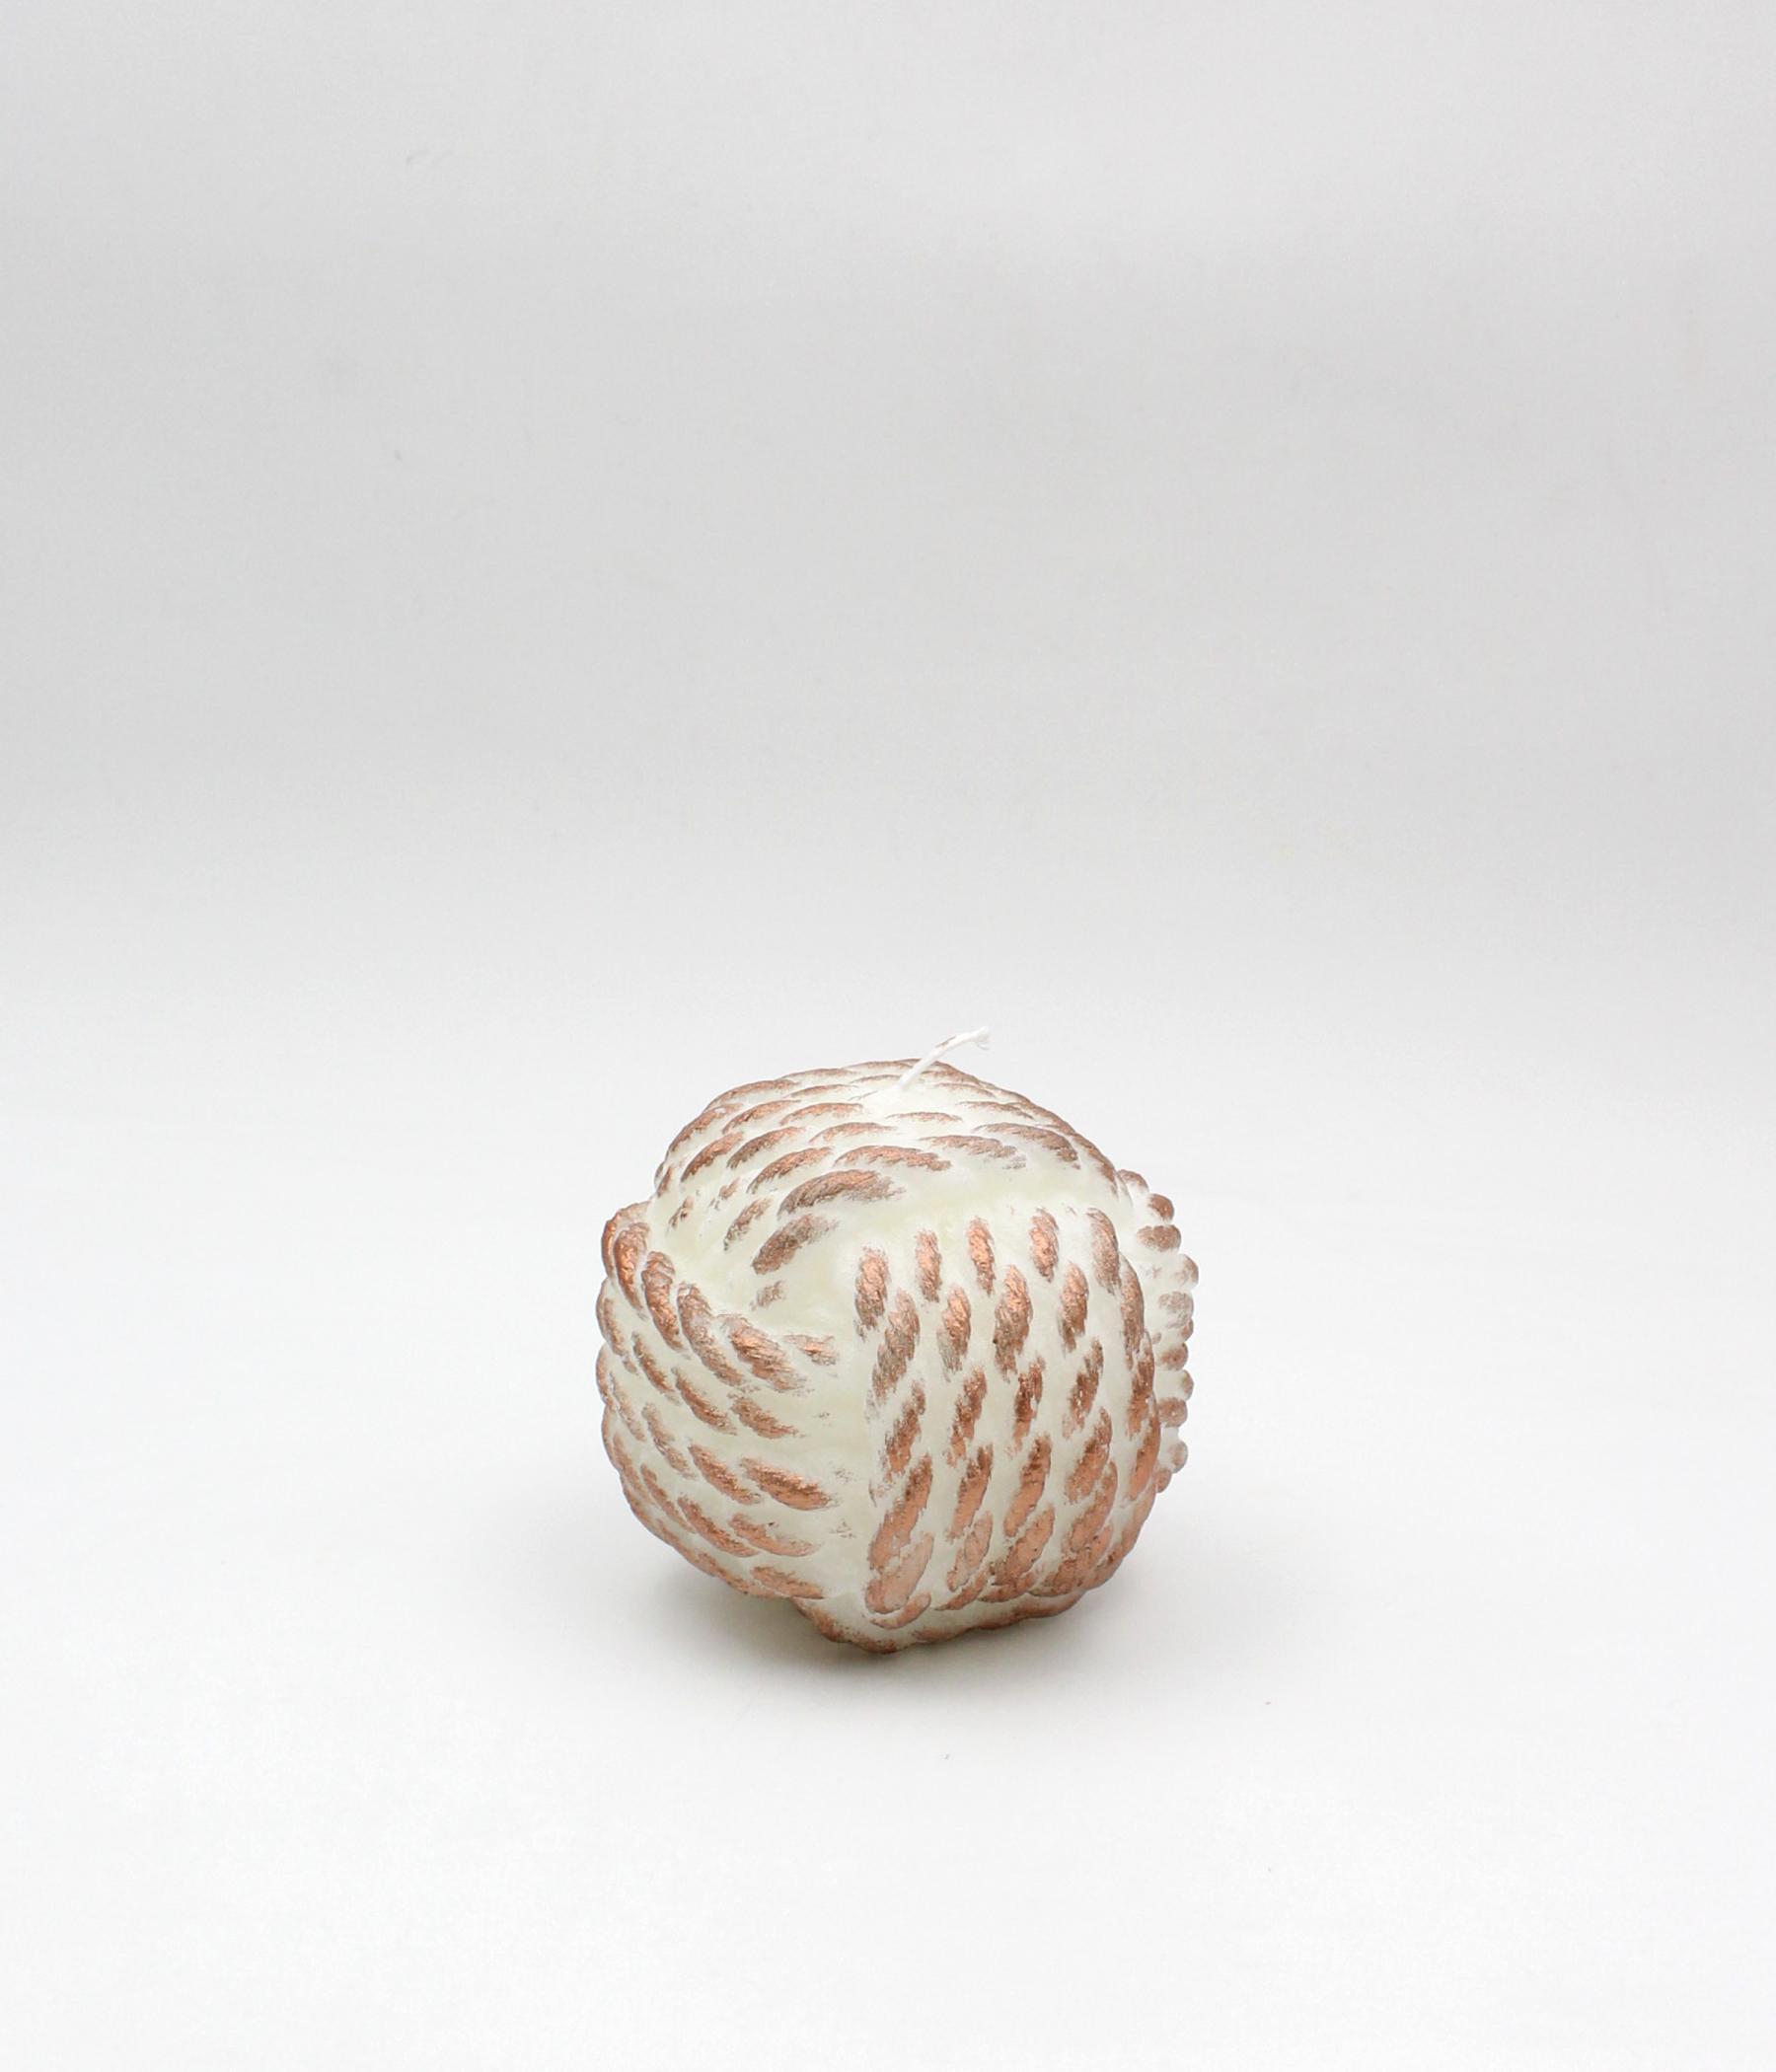 Candela corda sfera spugnata